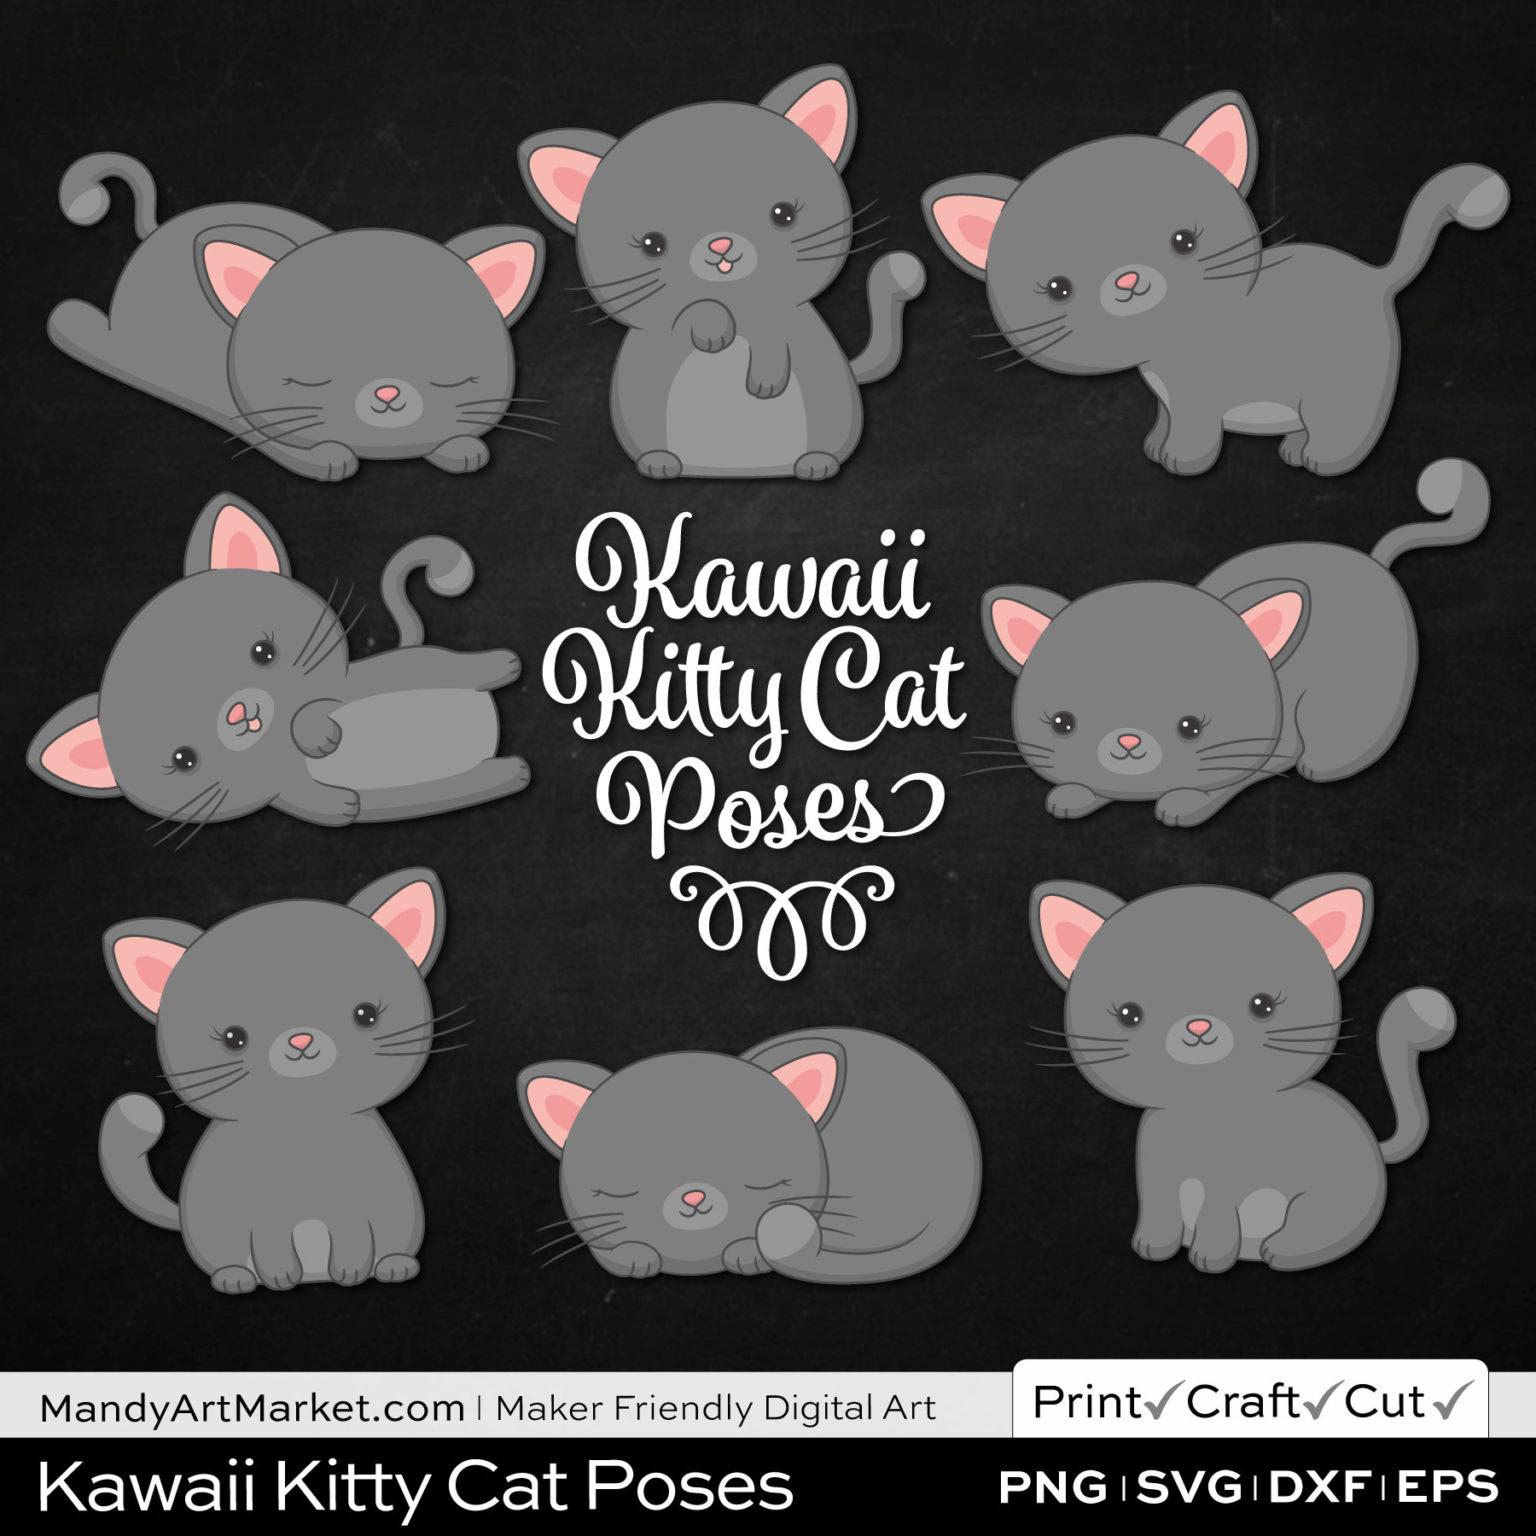 Pebble Gray Kawaii Kitty Cat Poses Clipart on Black Background